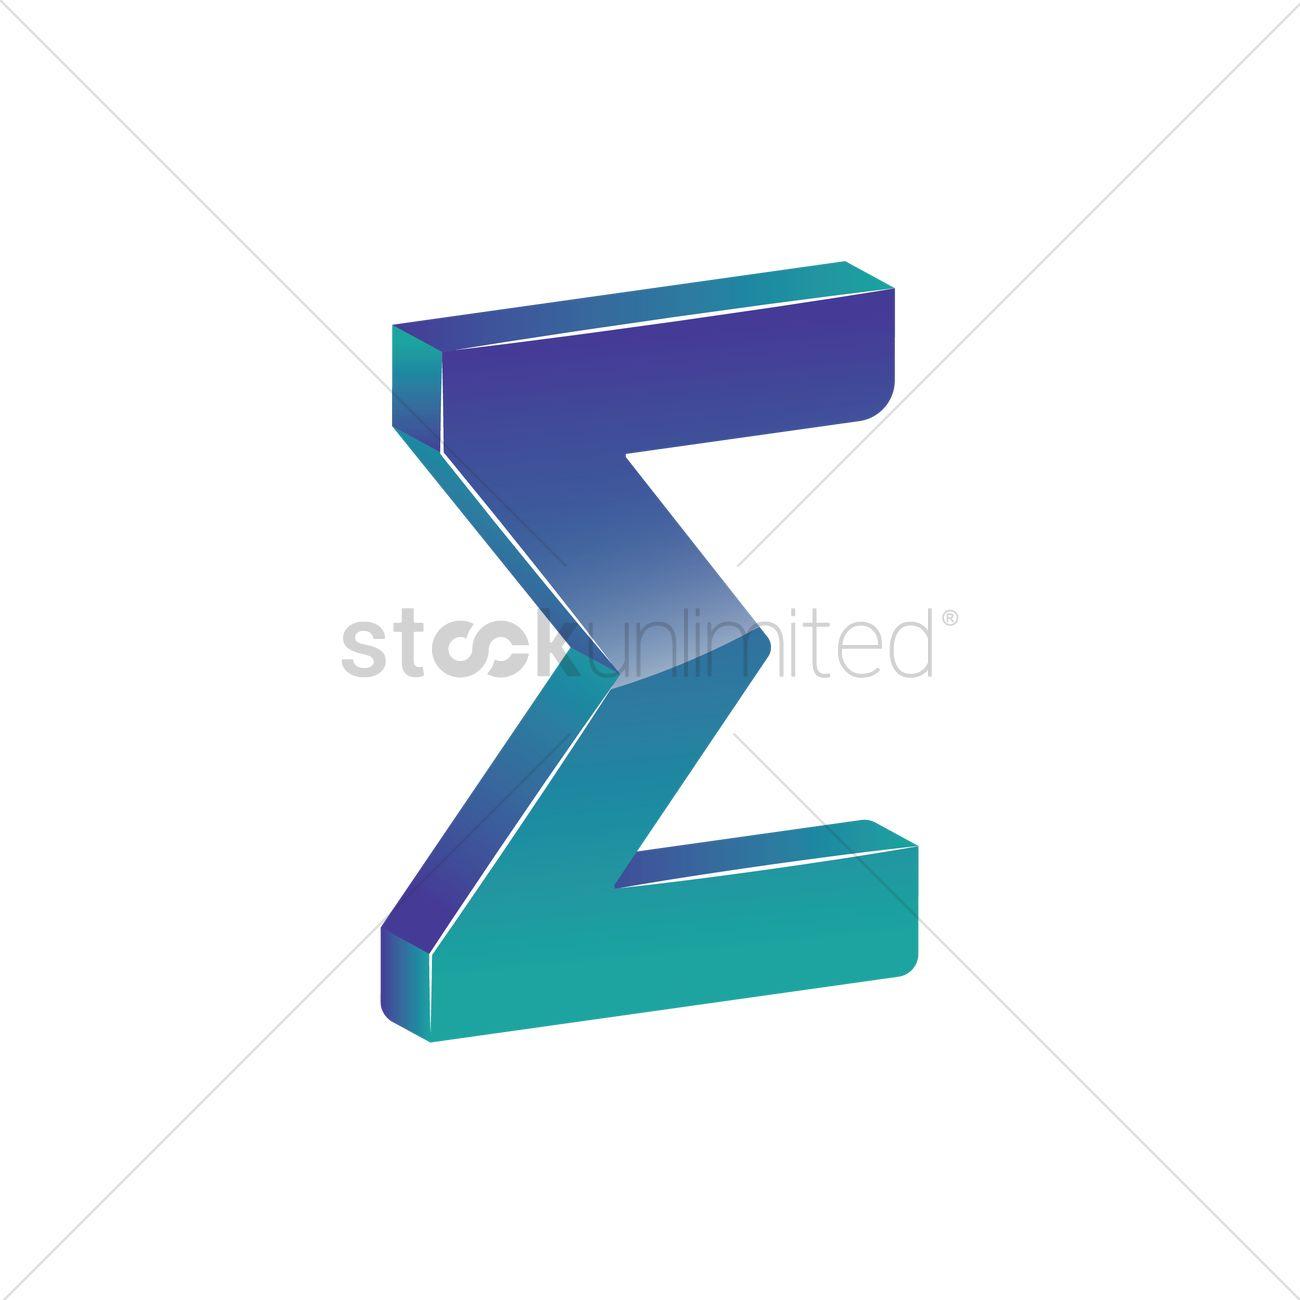 Sigma symbol vector image 1866475 stockunlimited sigma symbol vector graphic biocorpaavc Choice Image